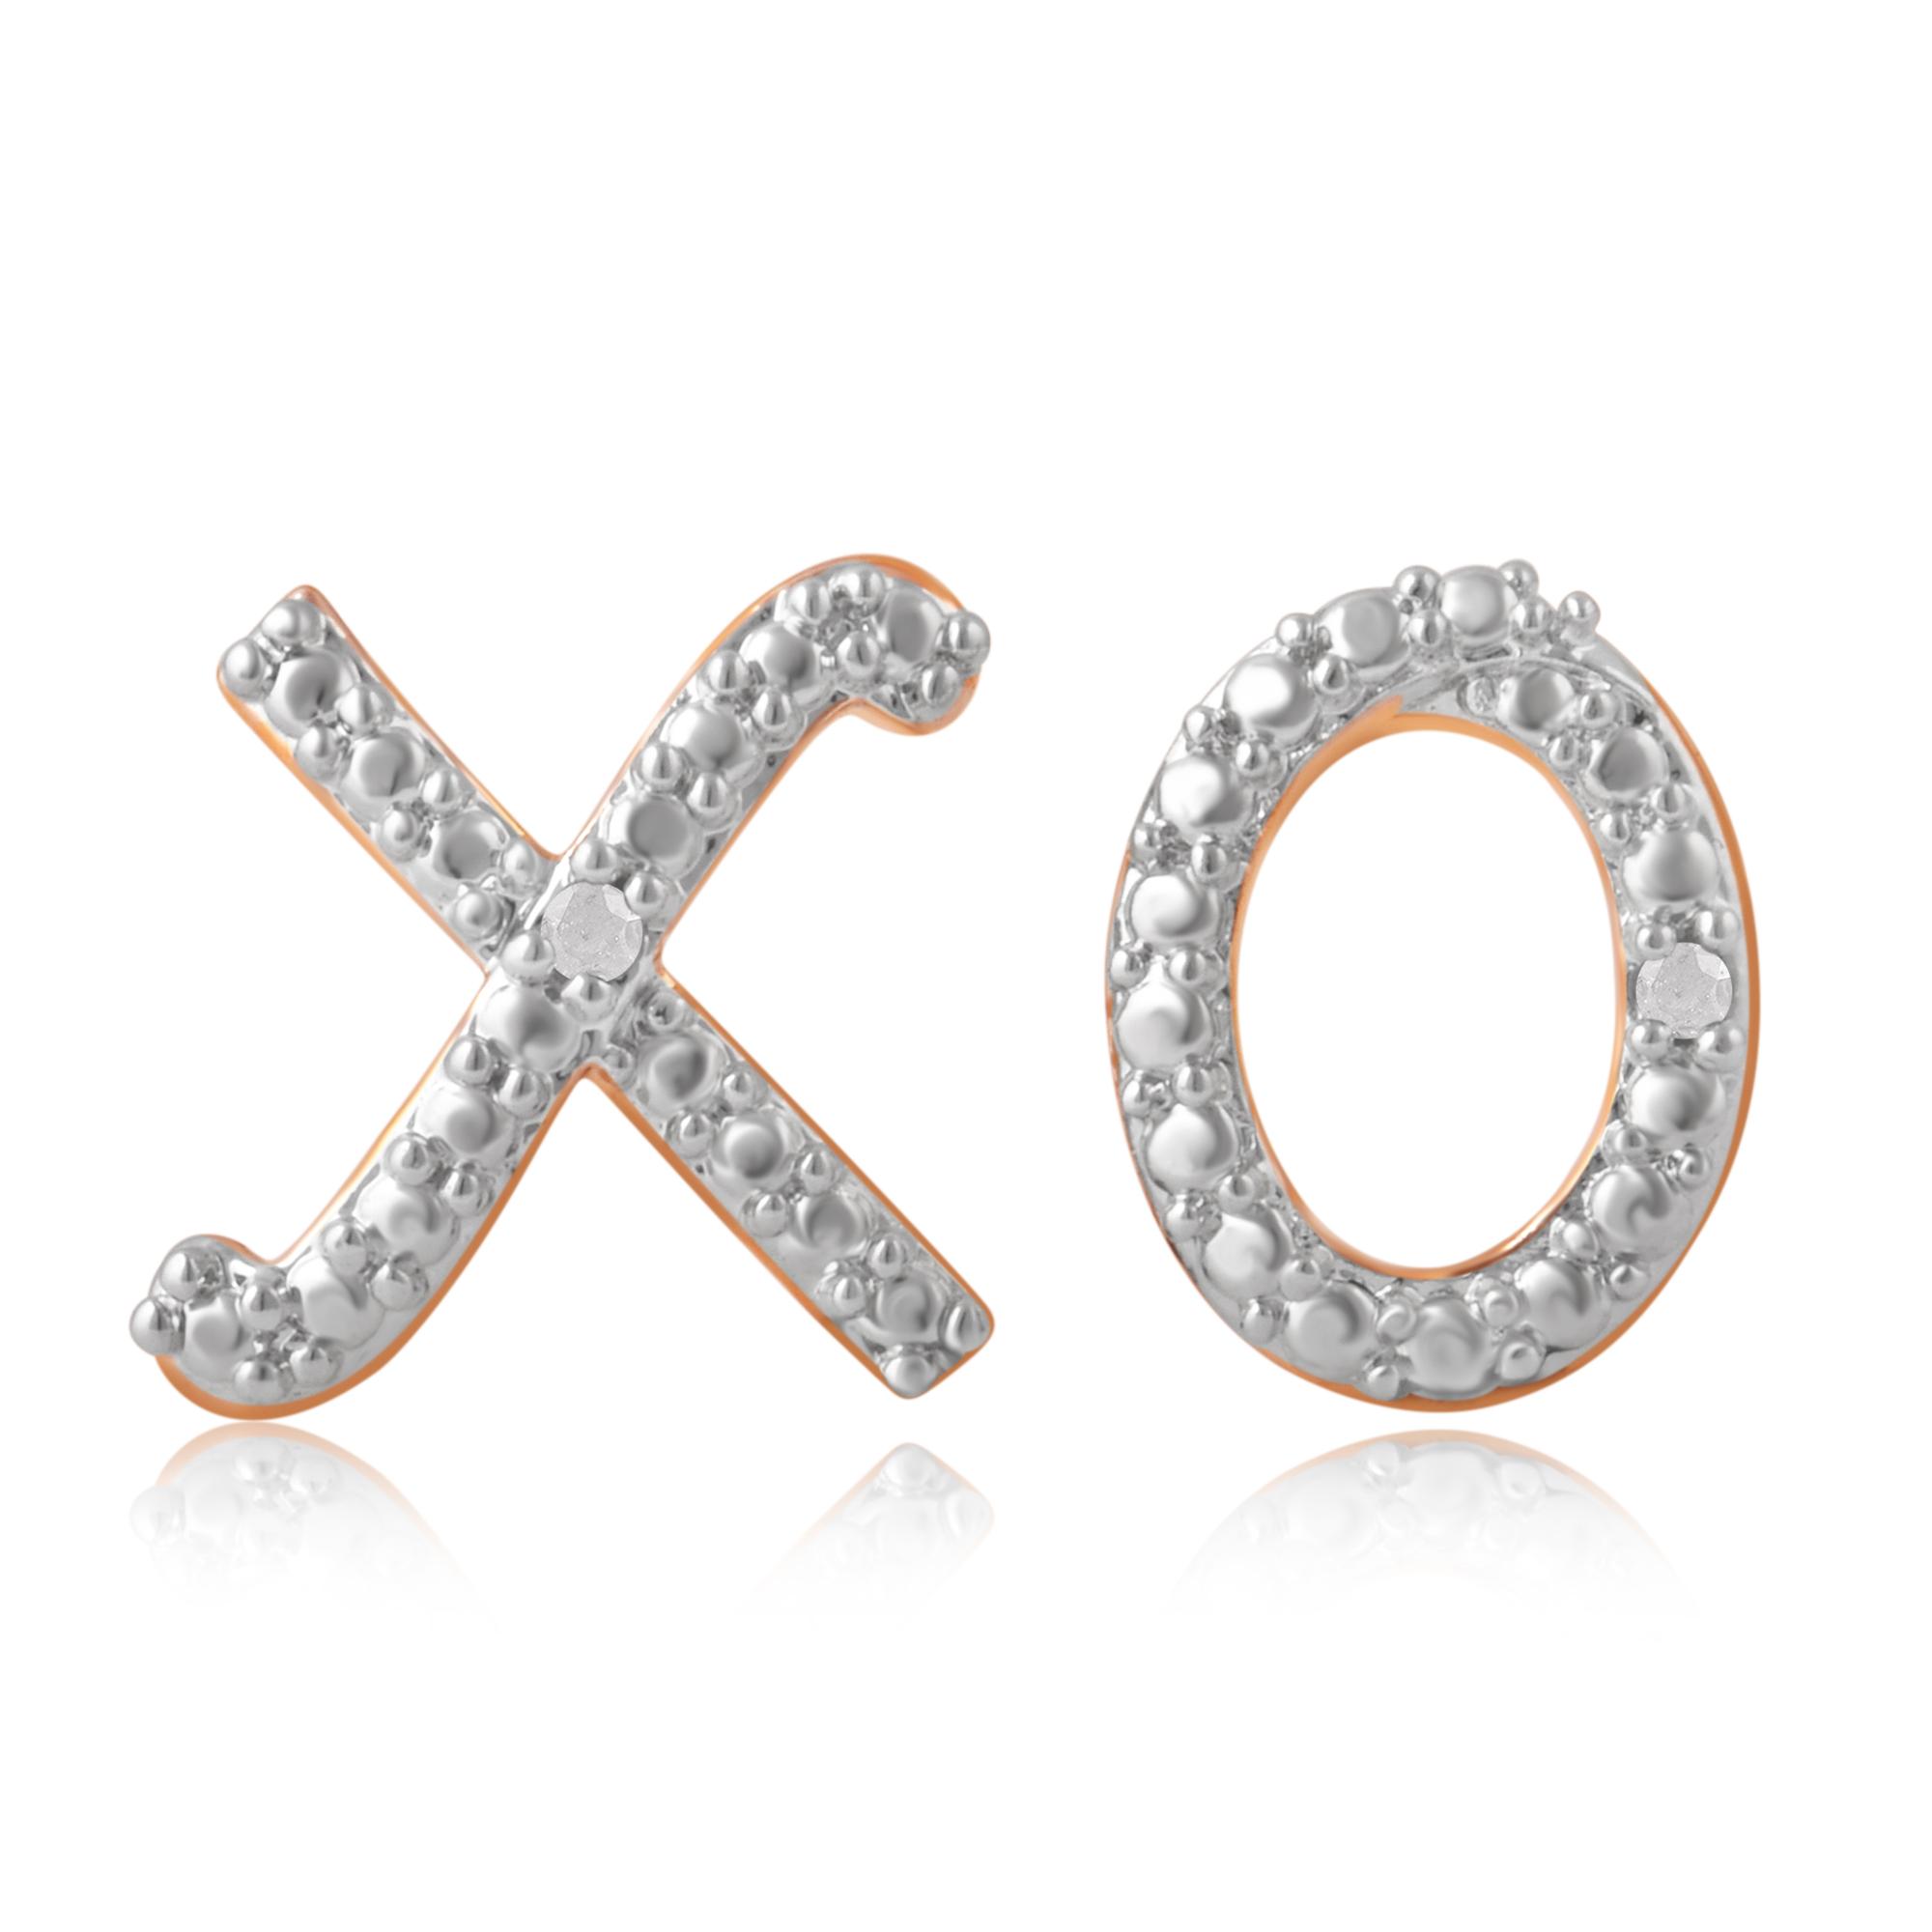 Diamond Accent X O Earrings - 3 Colors